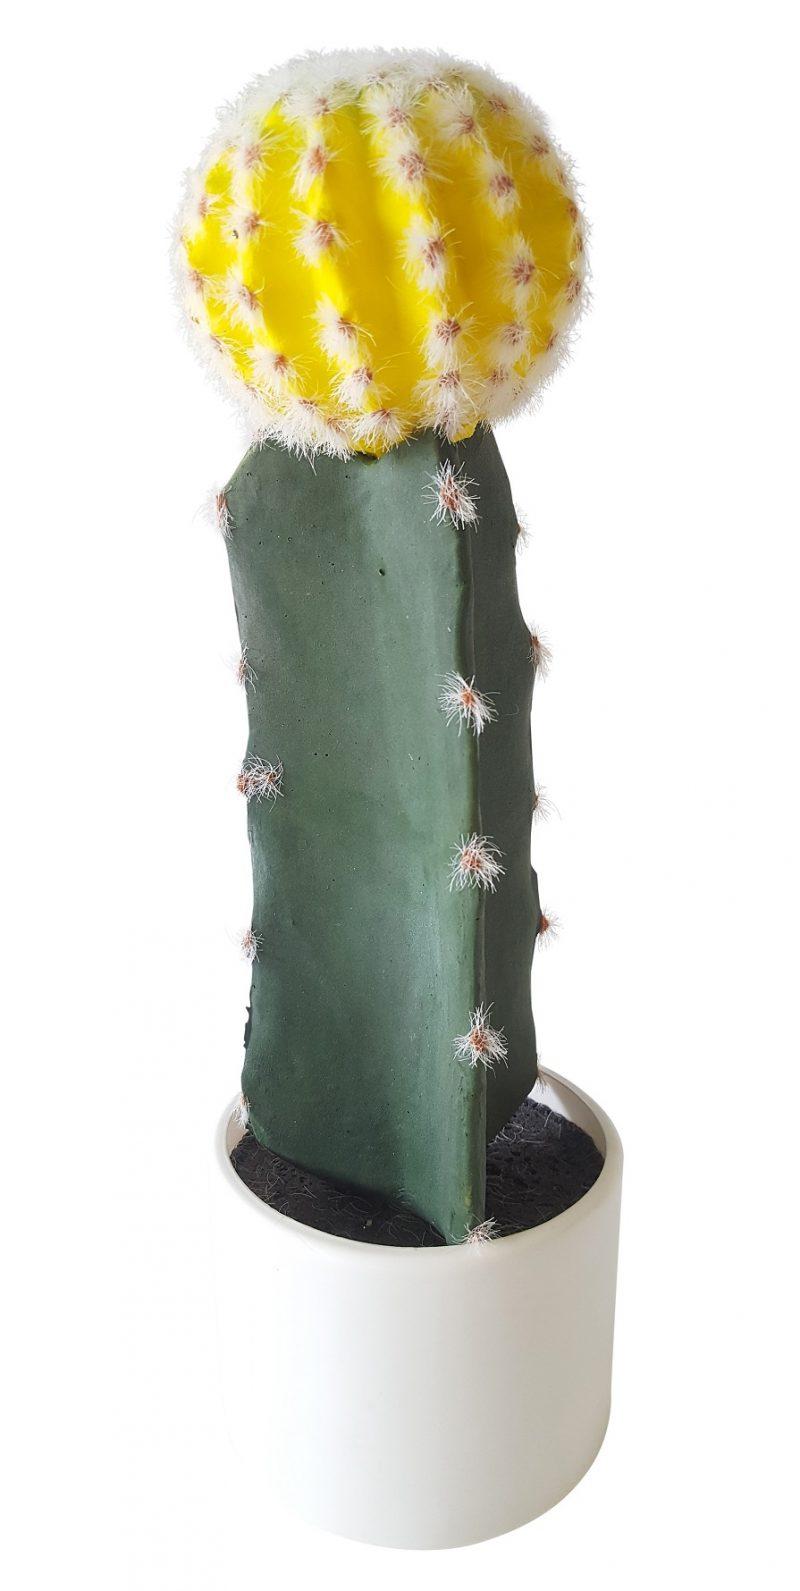 Nep Cactus met Gele Bol 38cm